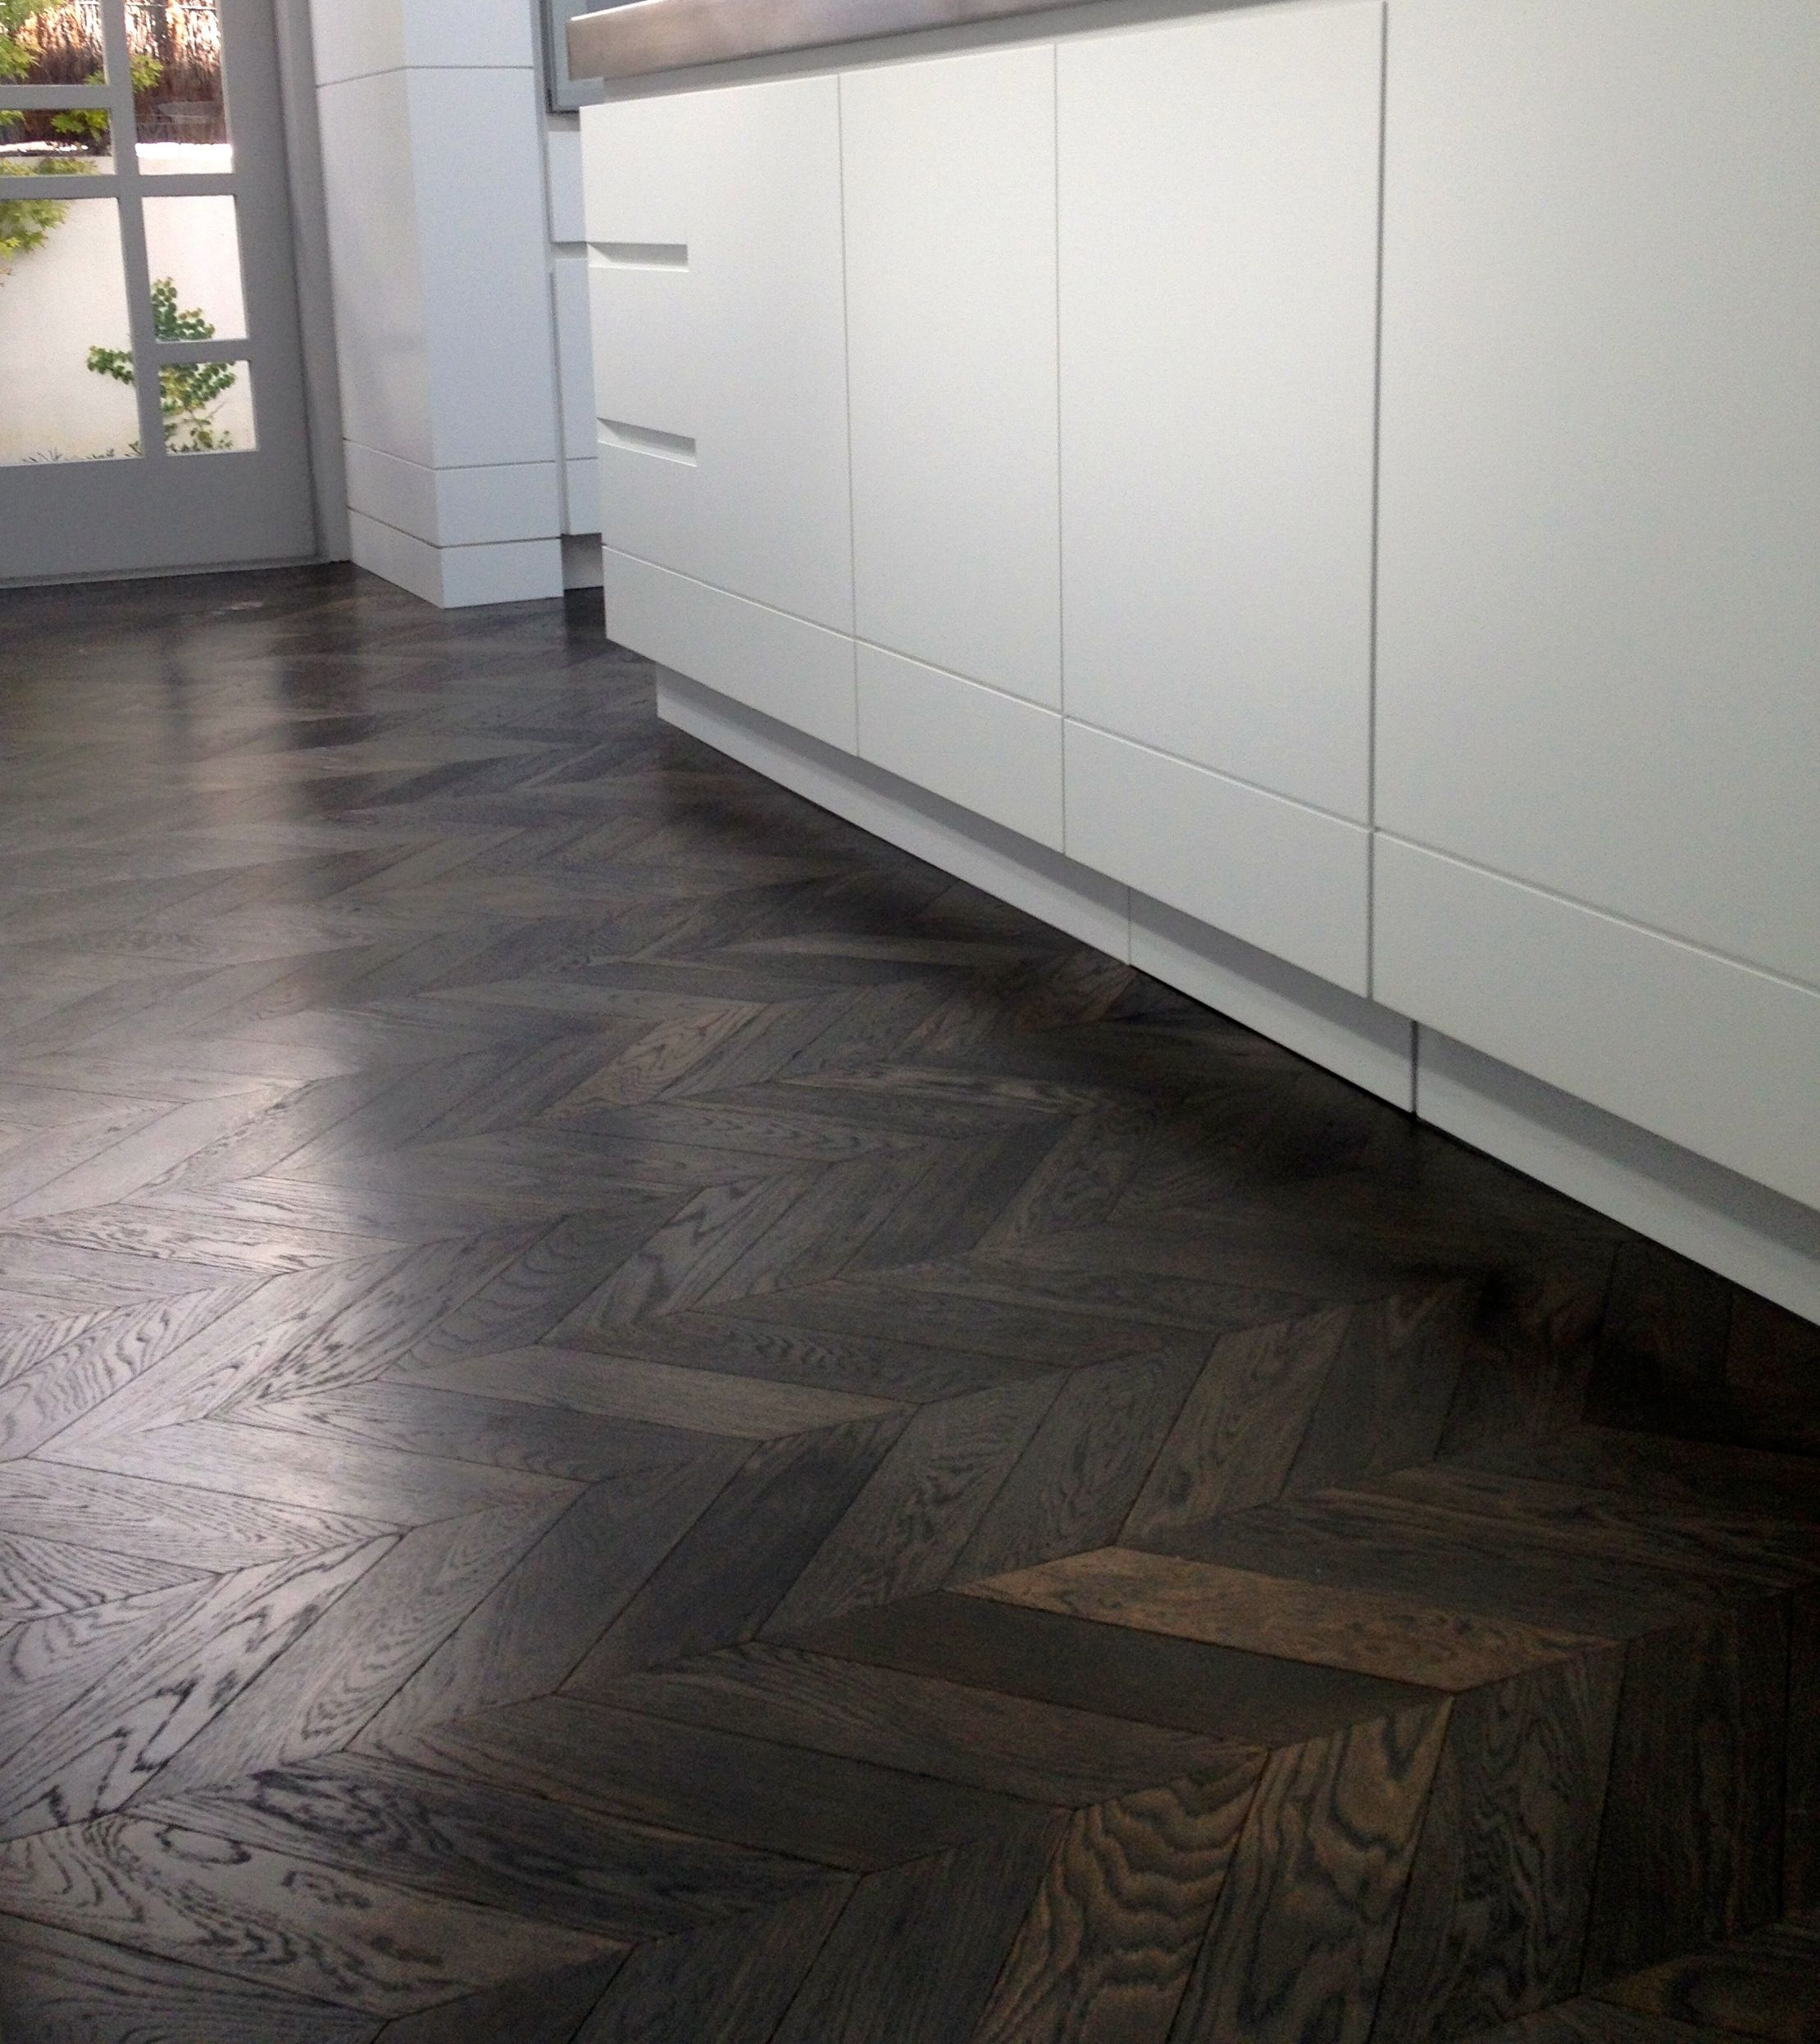 Chevron Floors Floors Now: French Oak Chevron Parquet Flooring In Imperial Grey